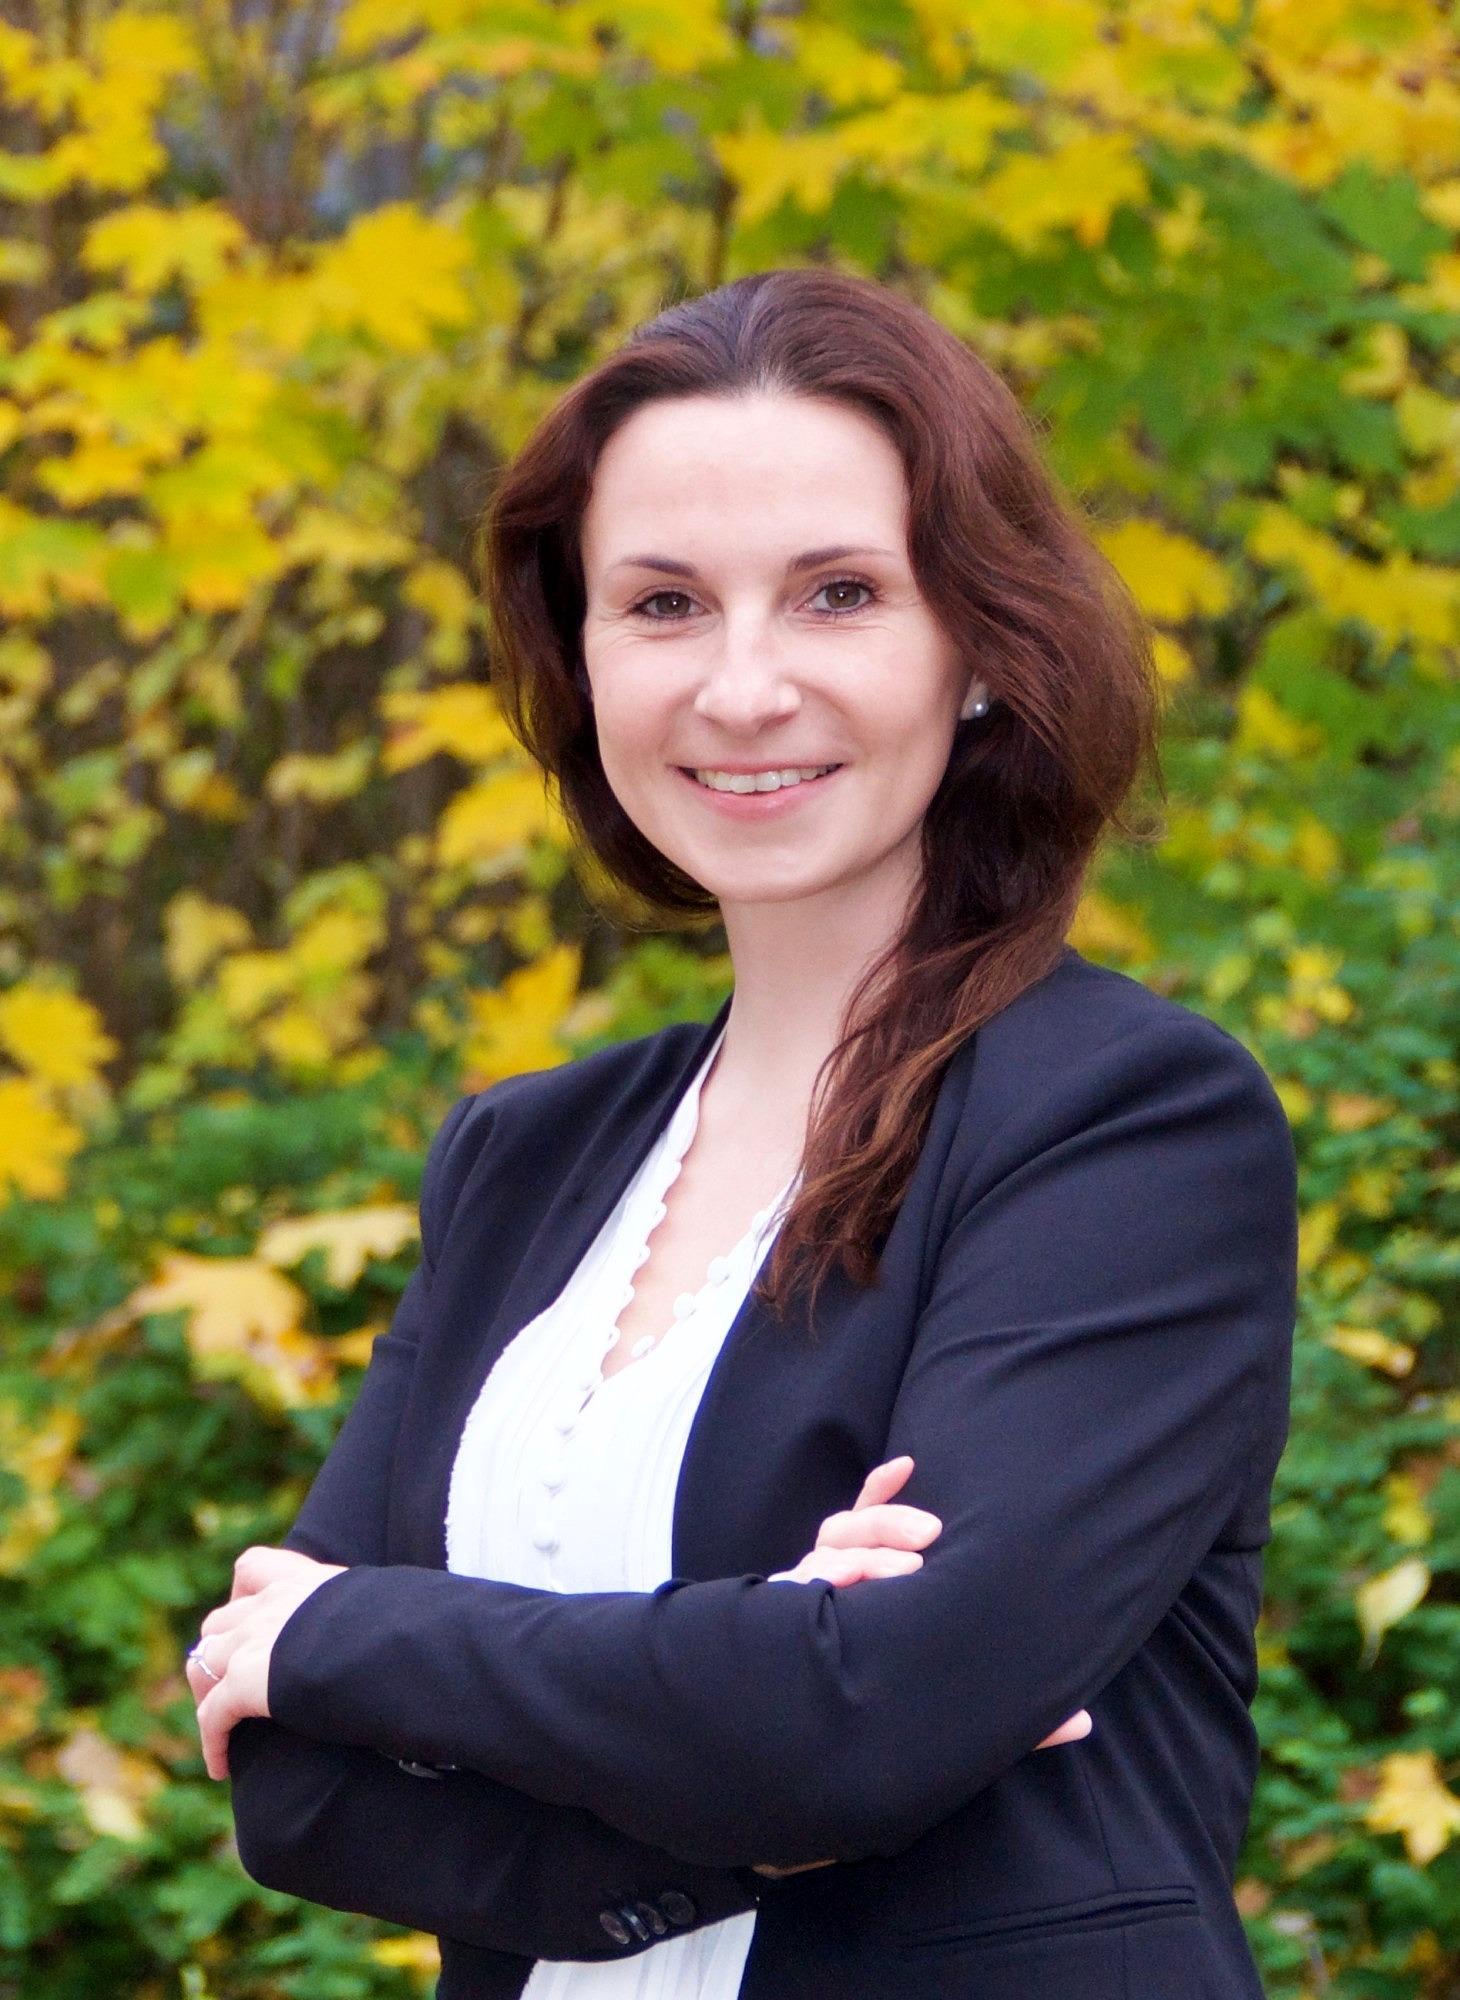 Dr. Nicole Hauke